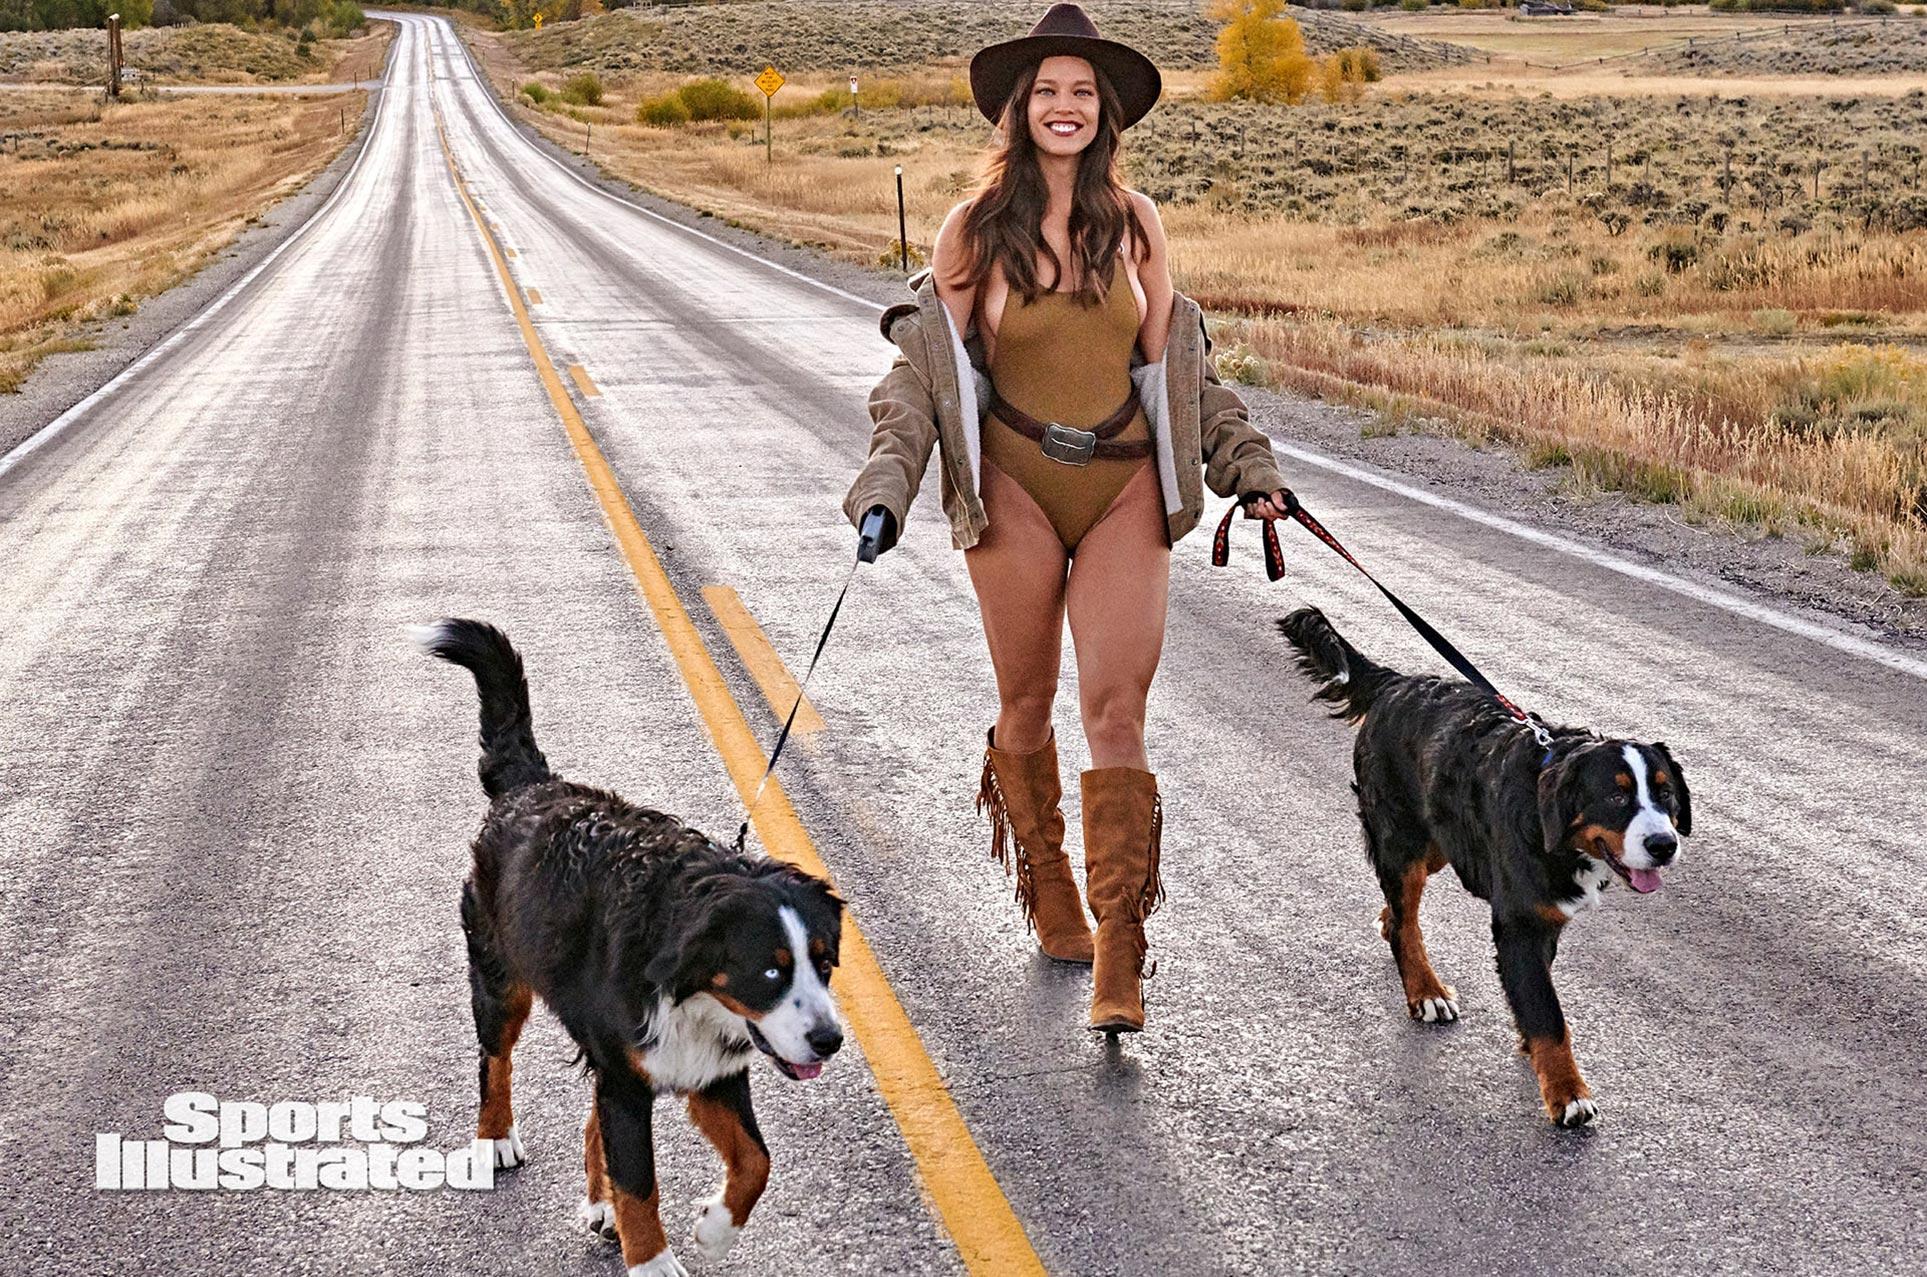 Эмили ДиДонато в каталоге купальников Sports Illustrated Swimsuit 2020 / фото 01